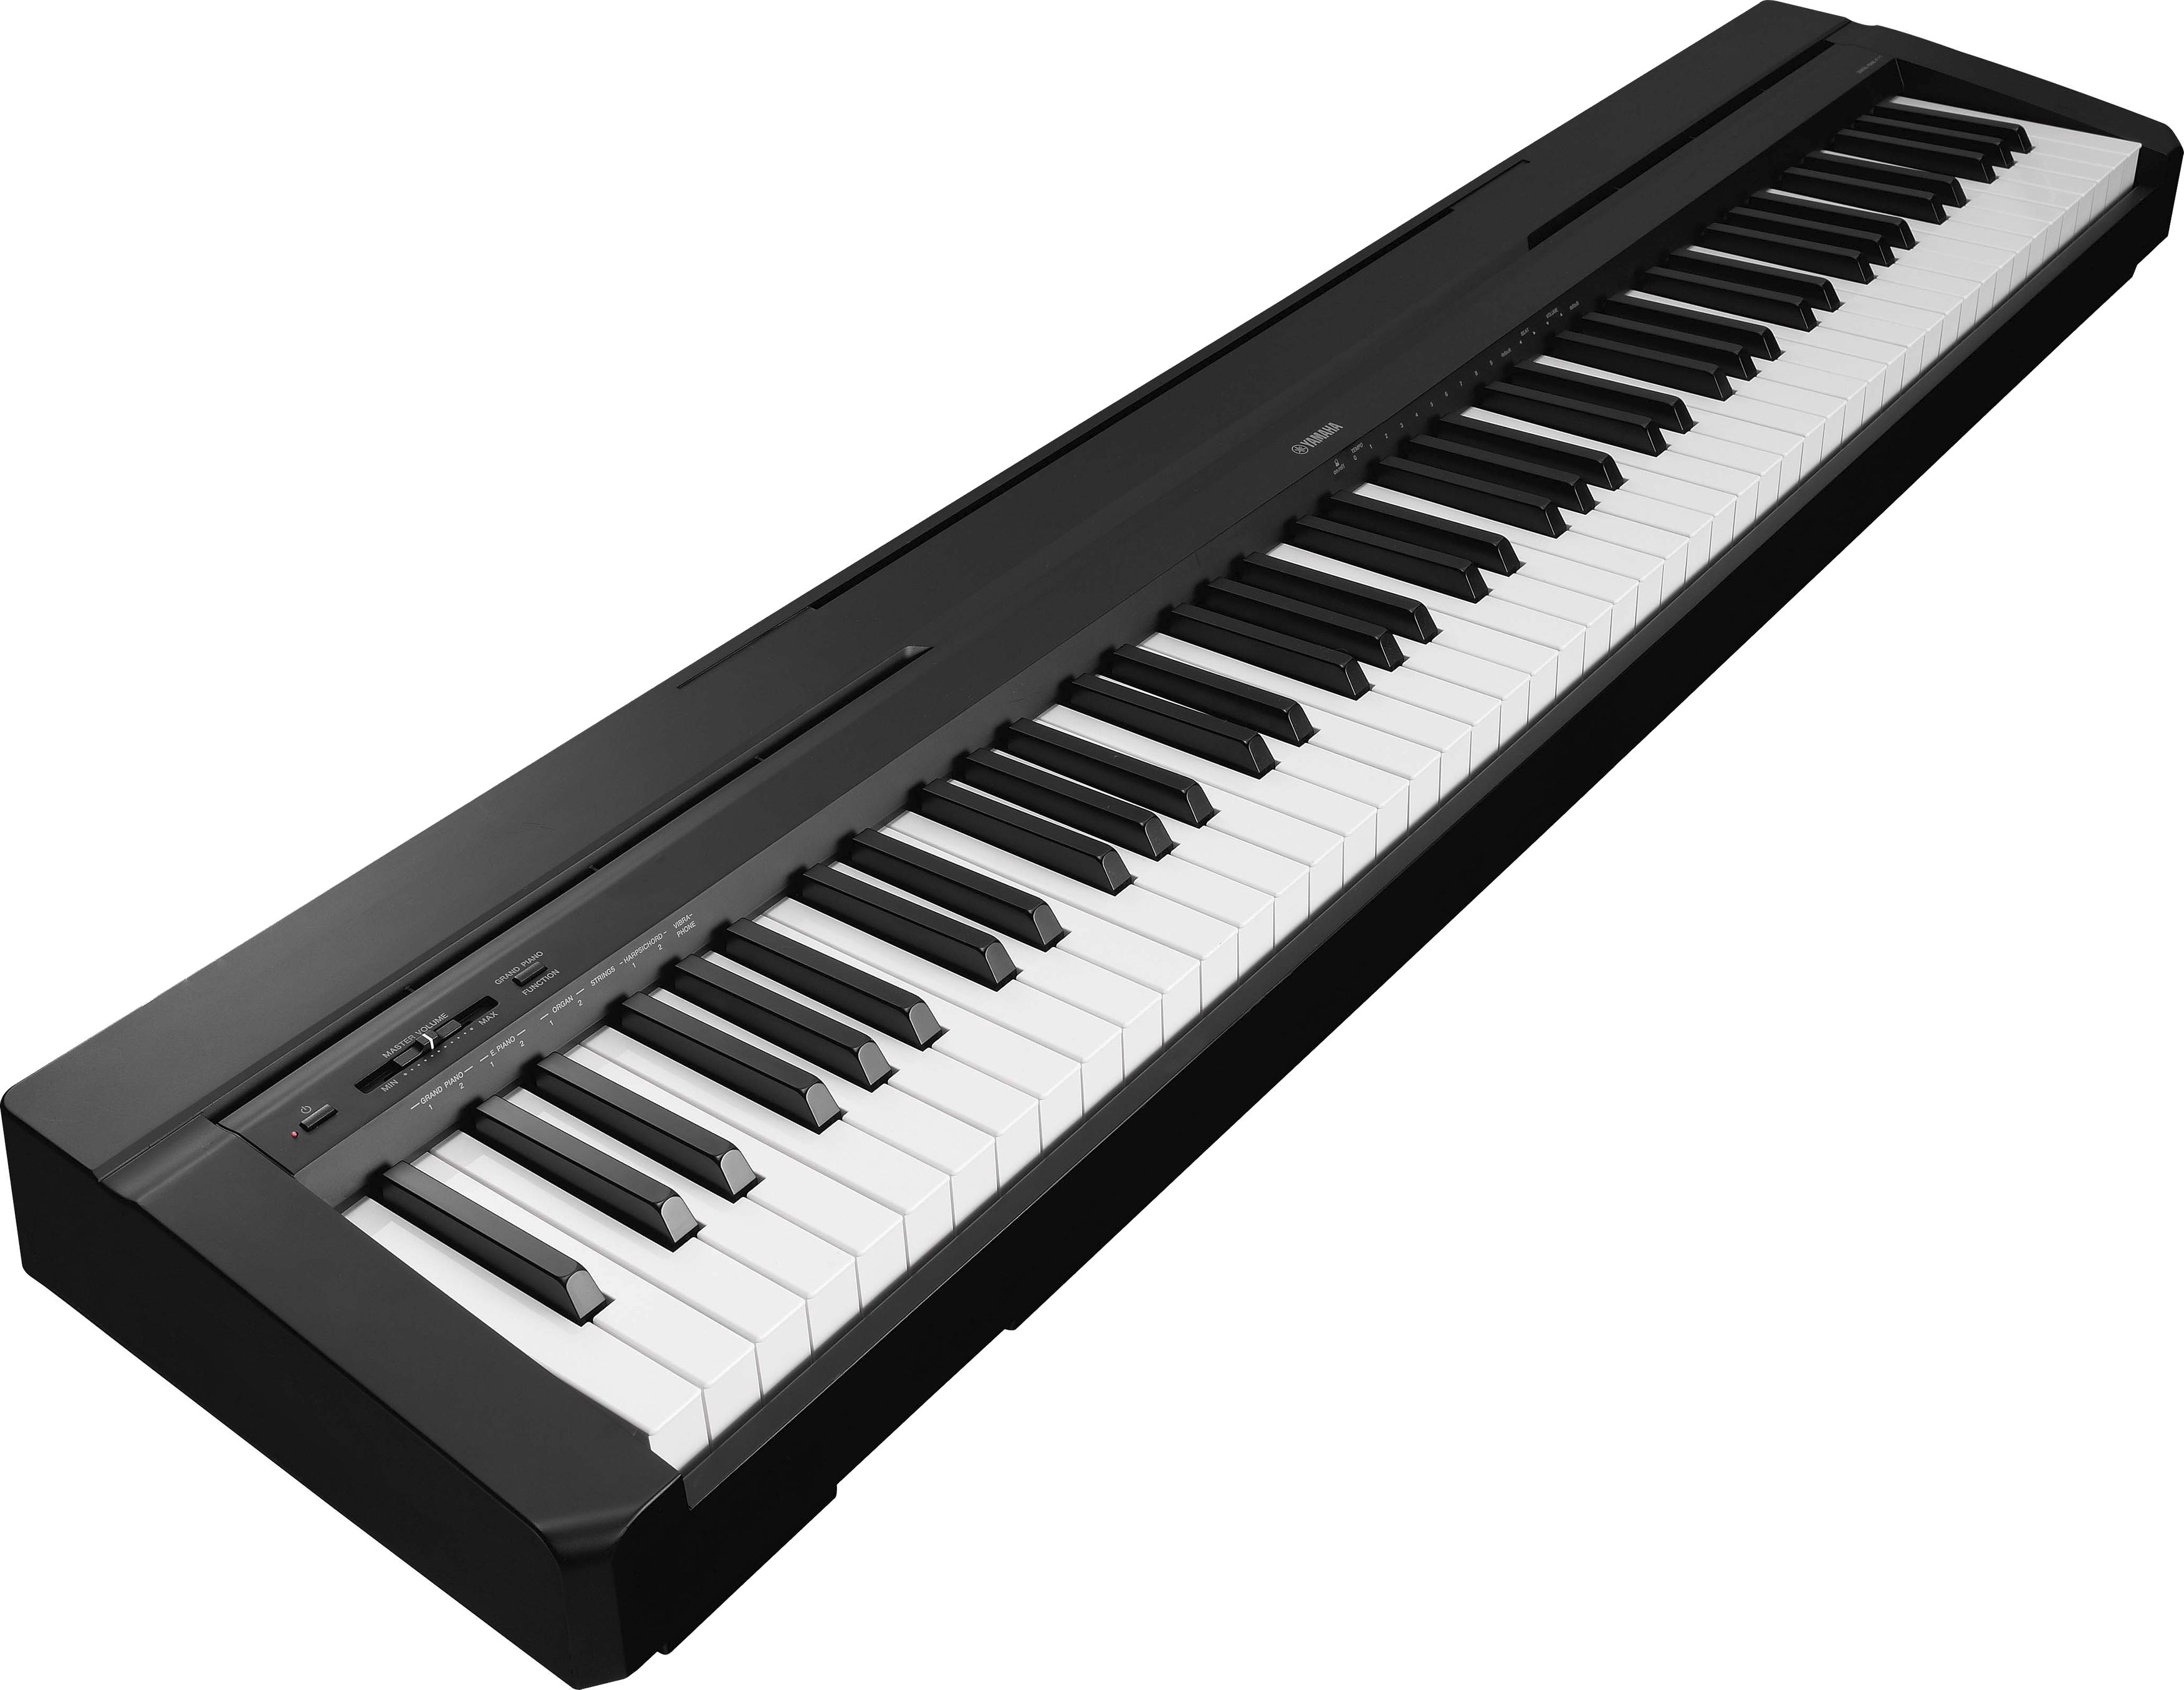 Music Keyboard PNG HD - 139677